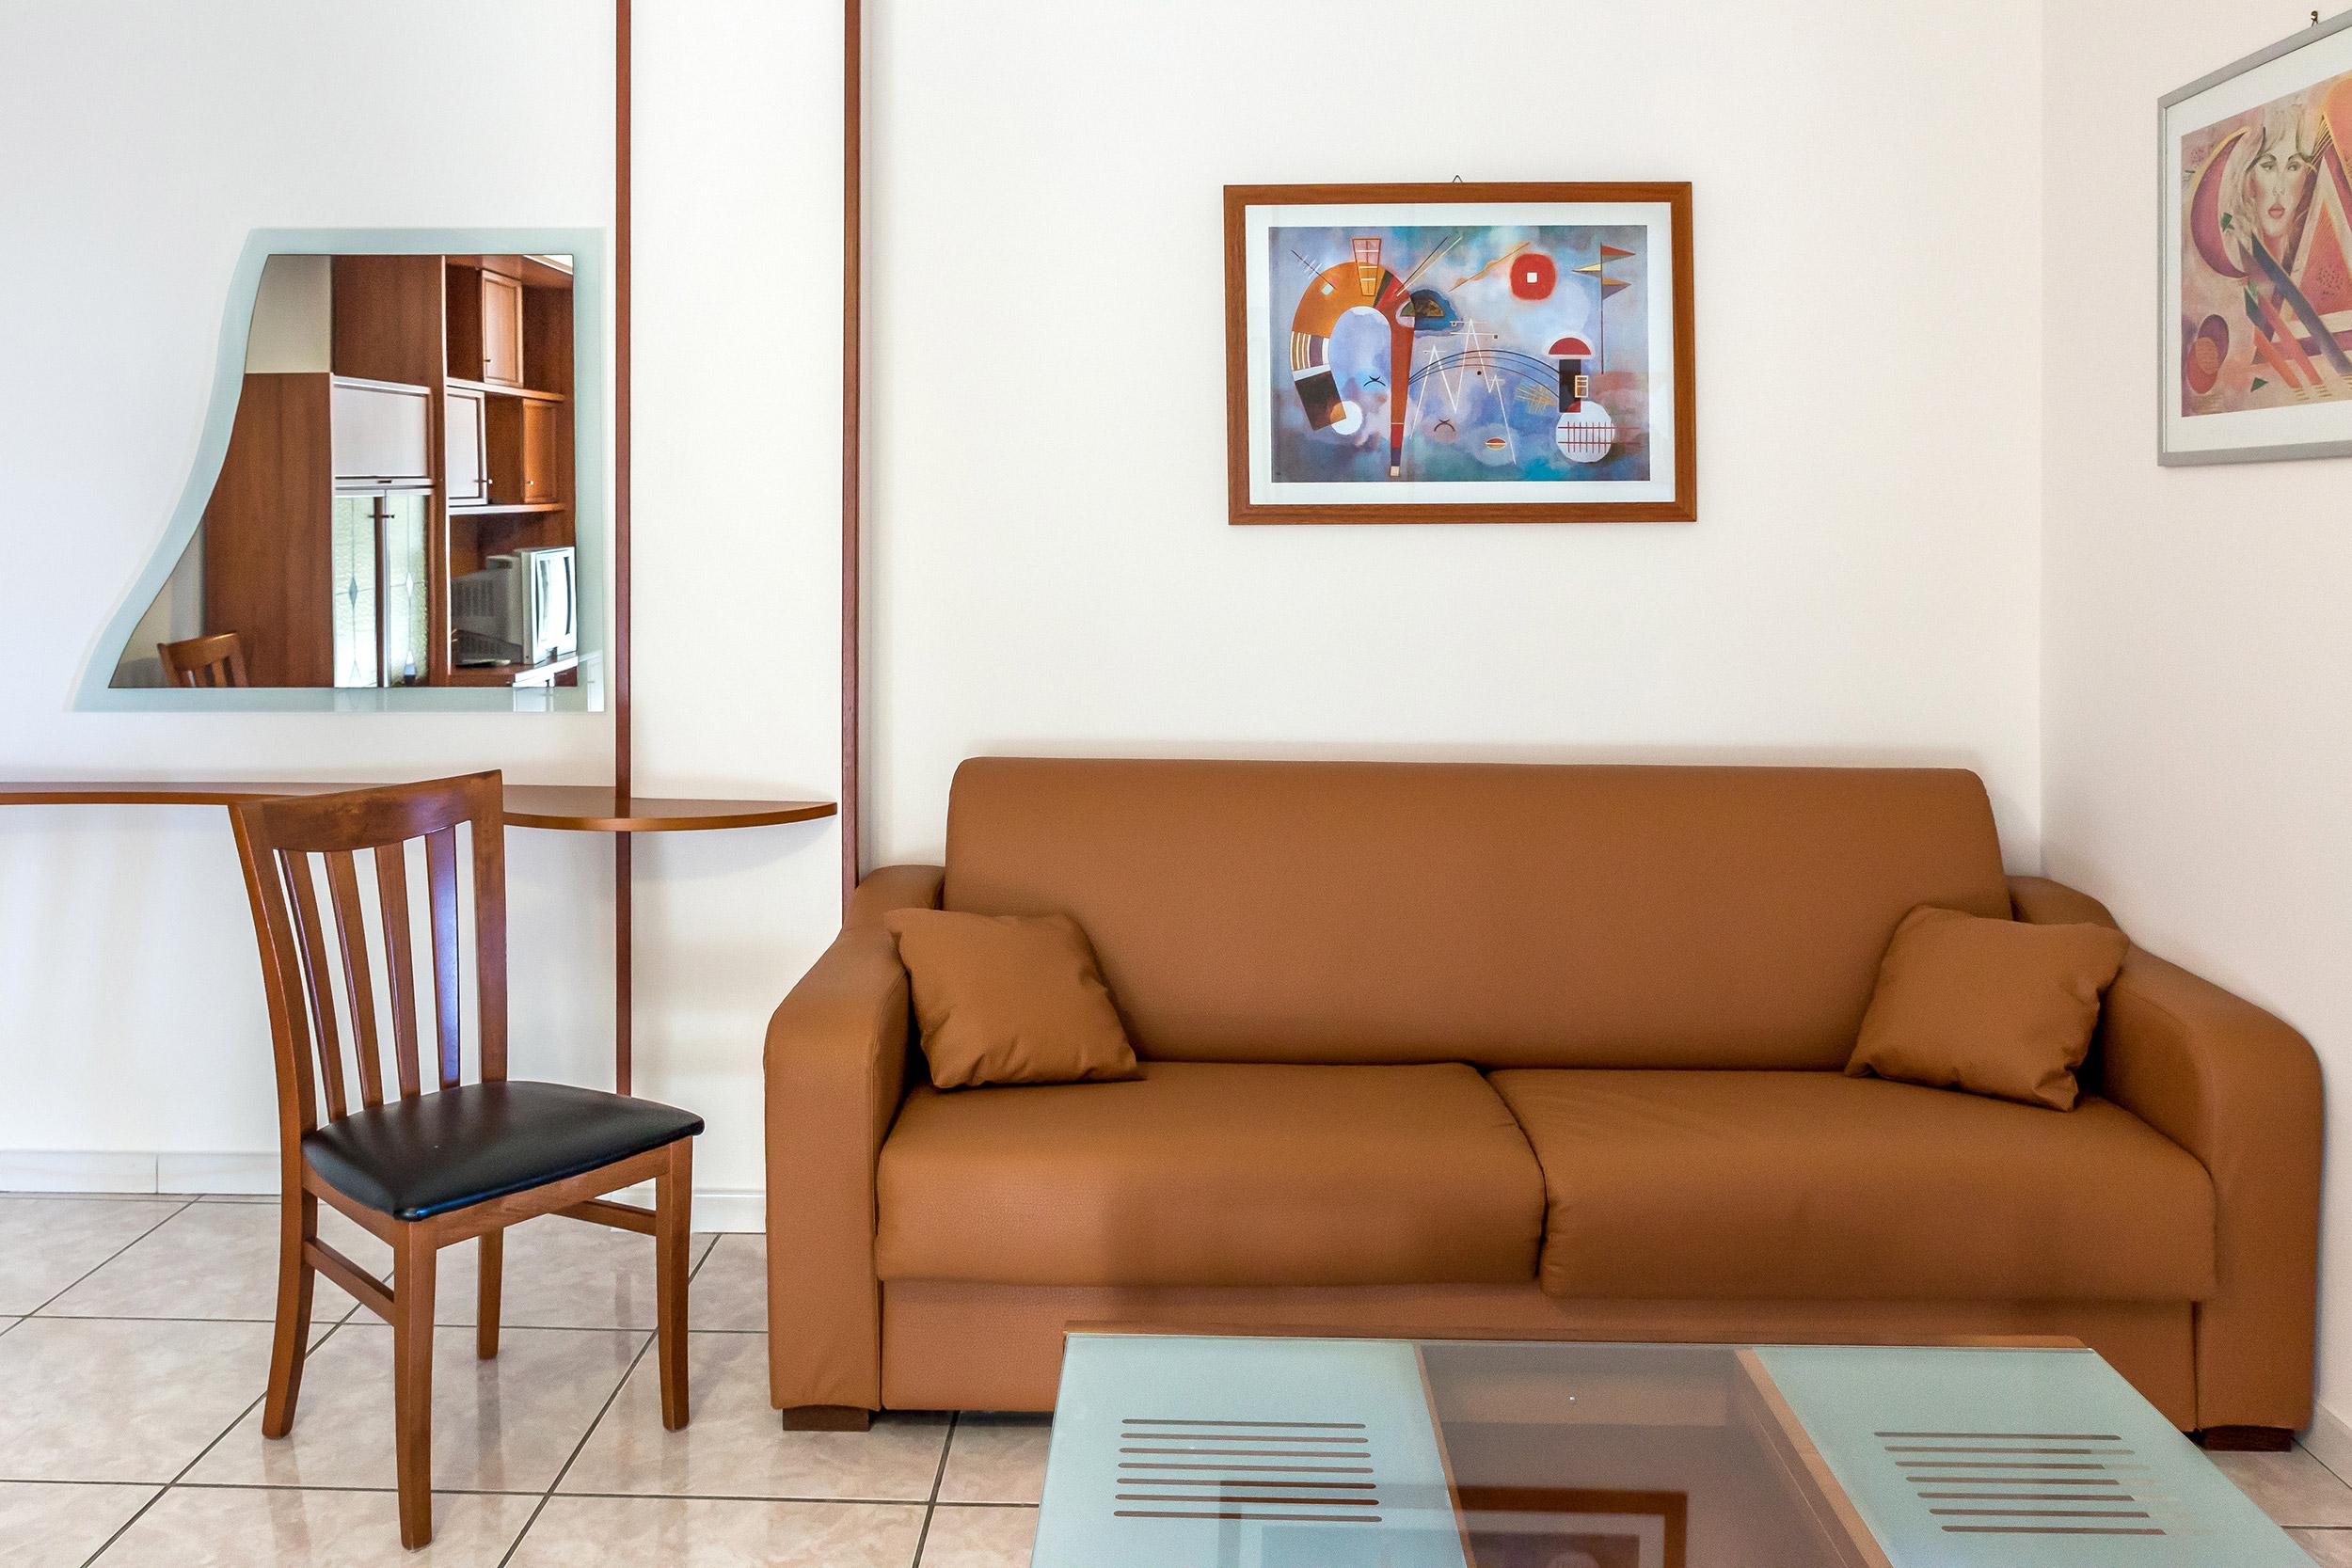 Ferienwohnung Appartamento vista mare a Gallipoli 4/6 posti - Baia Blu Side (2574458), Gallipoli, Lecce, Apulien, Italien, Bild 8